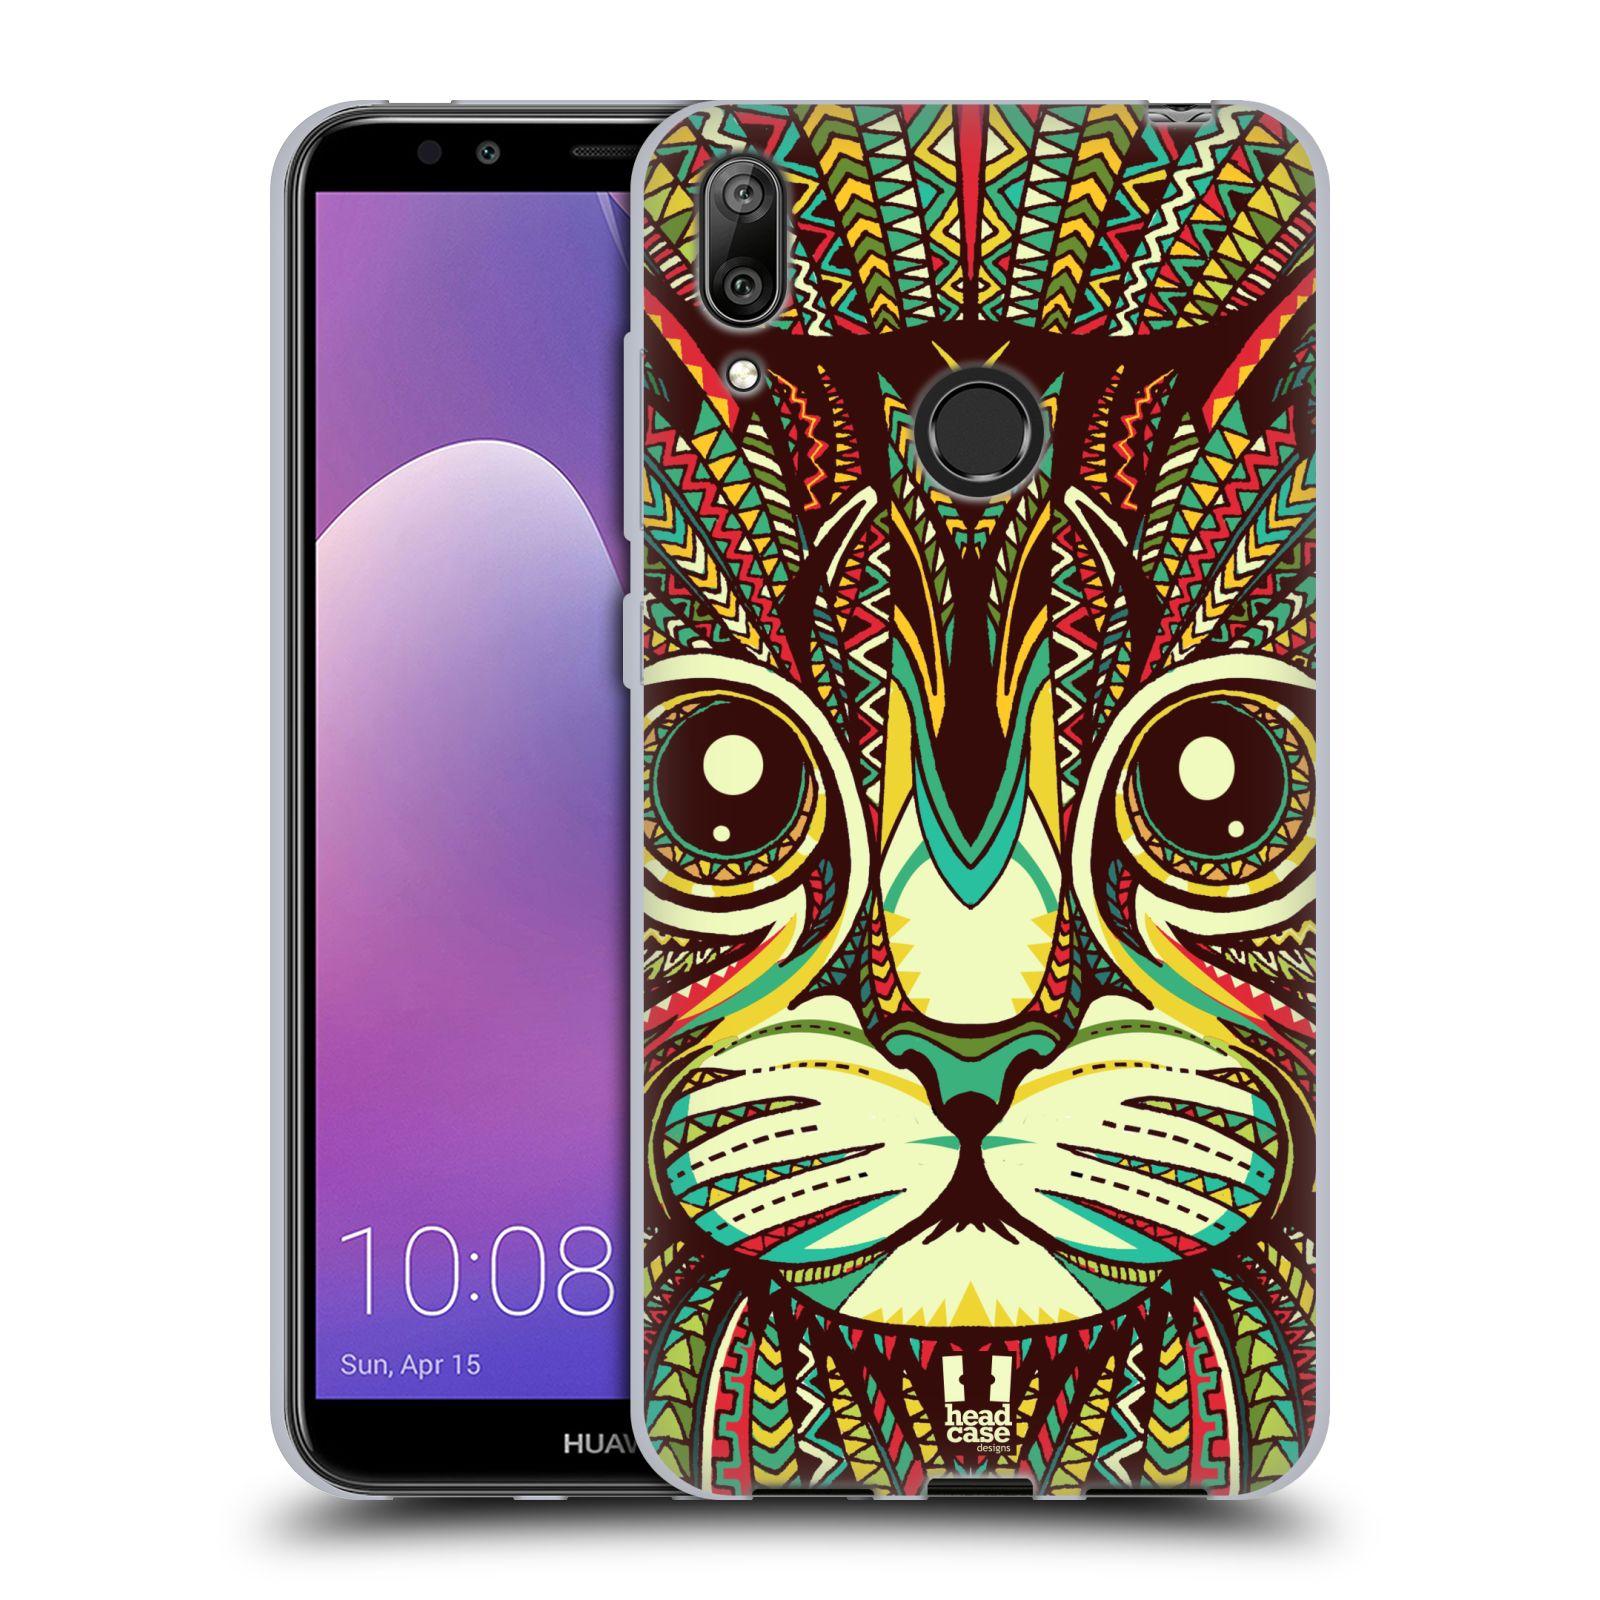 Silikonové pouzdro na mobil Huawei Y7 (2019) - Head Case - AZTEC KOČKA